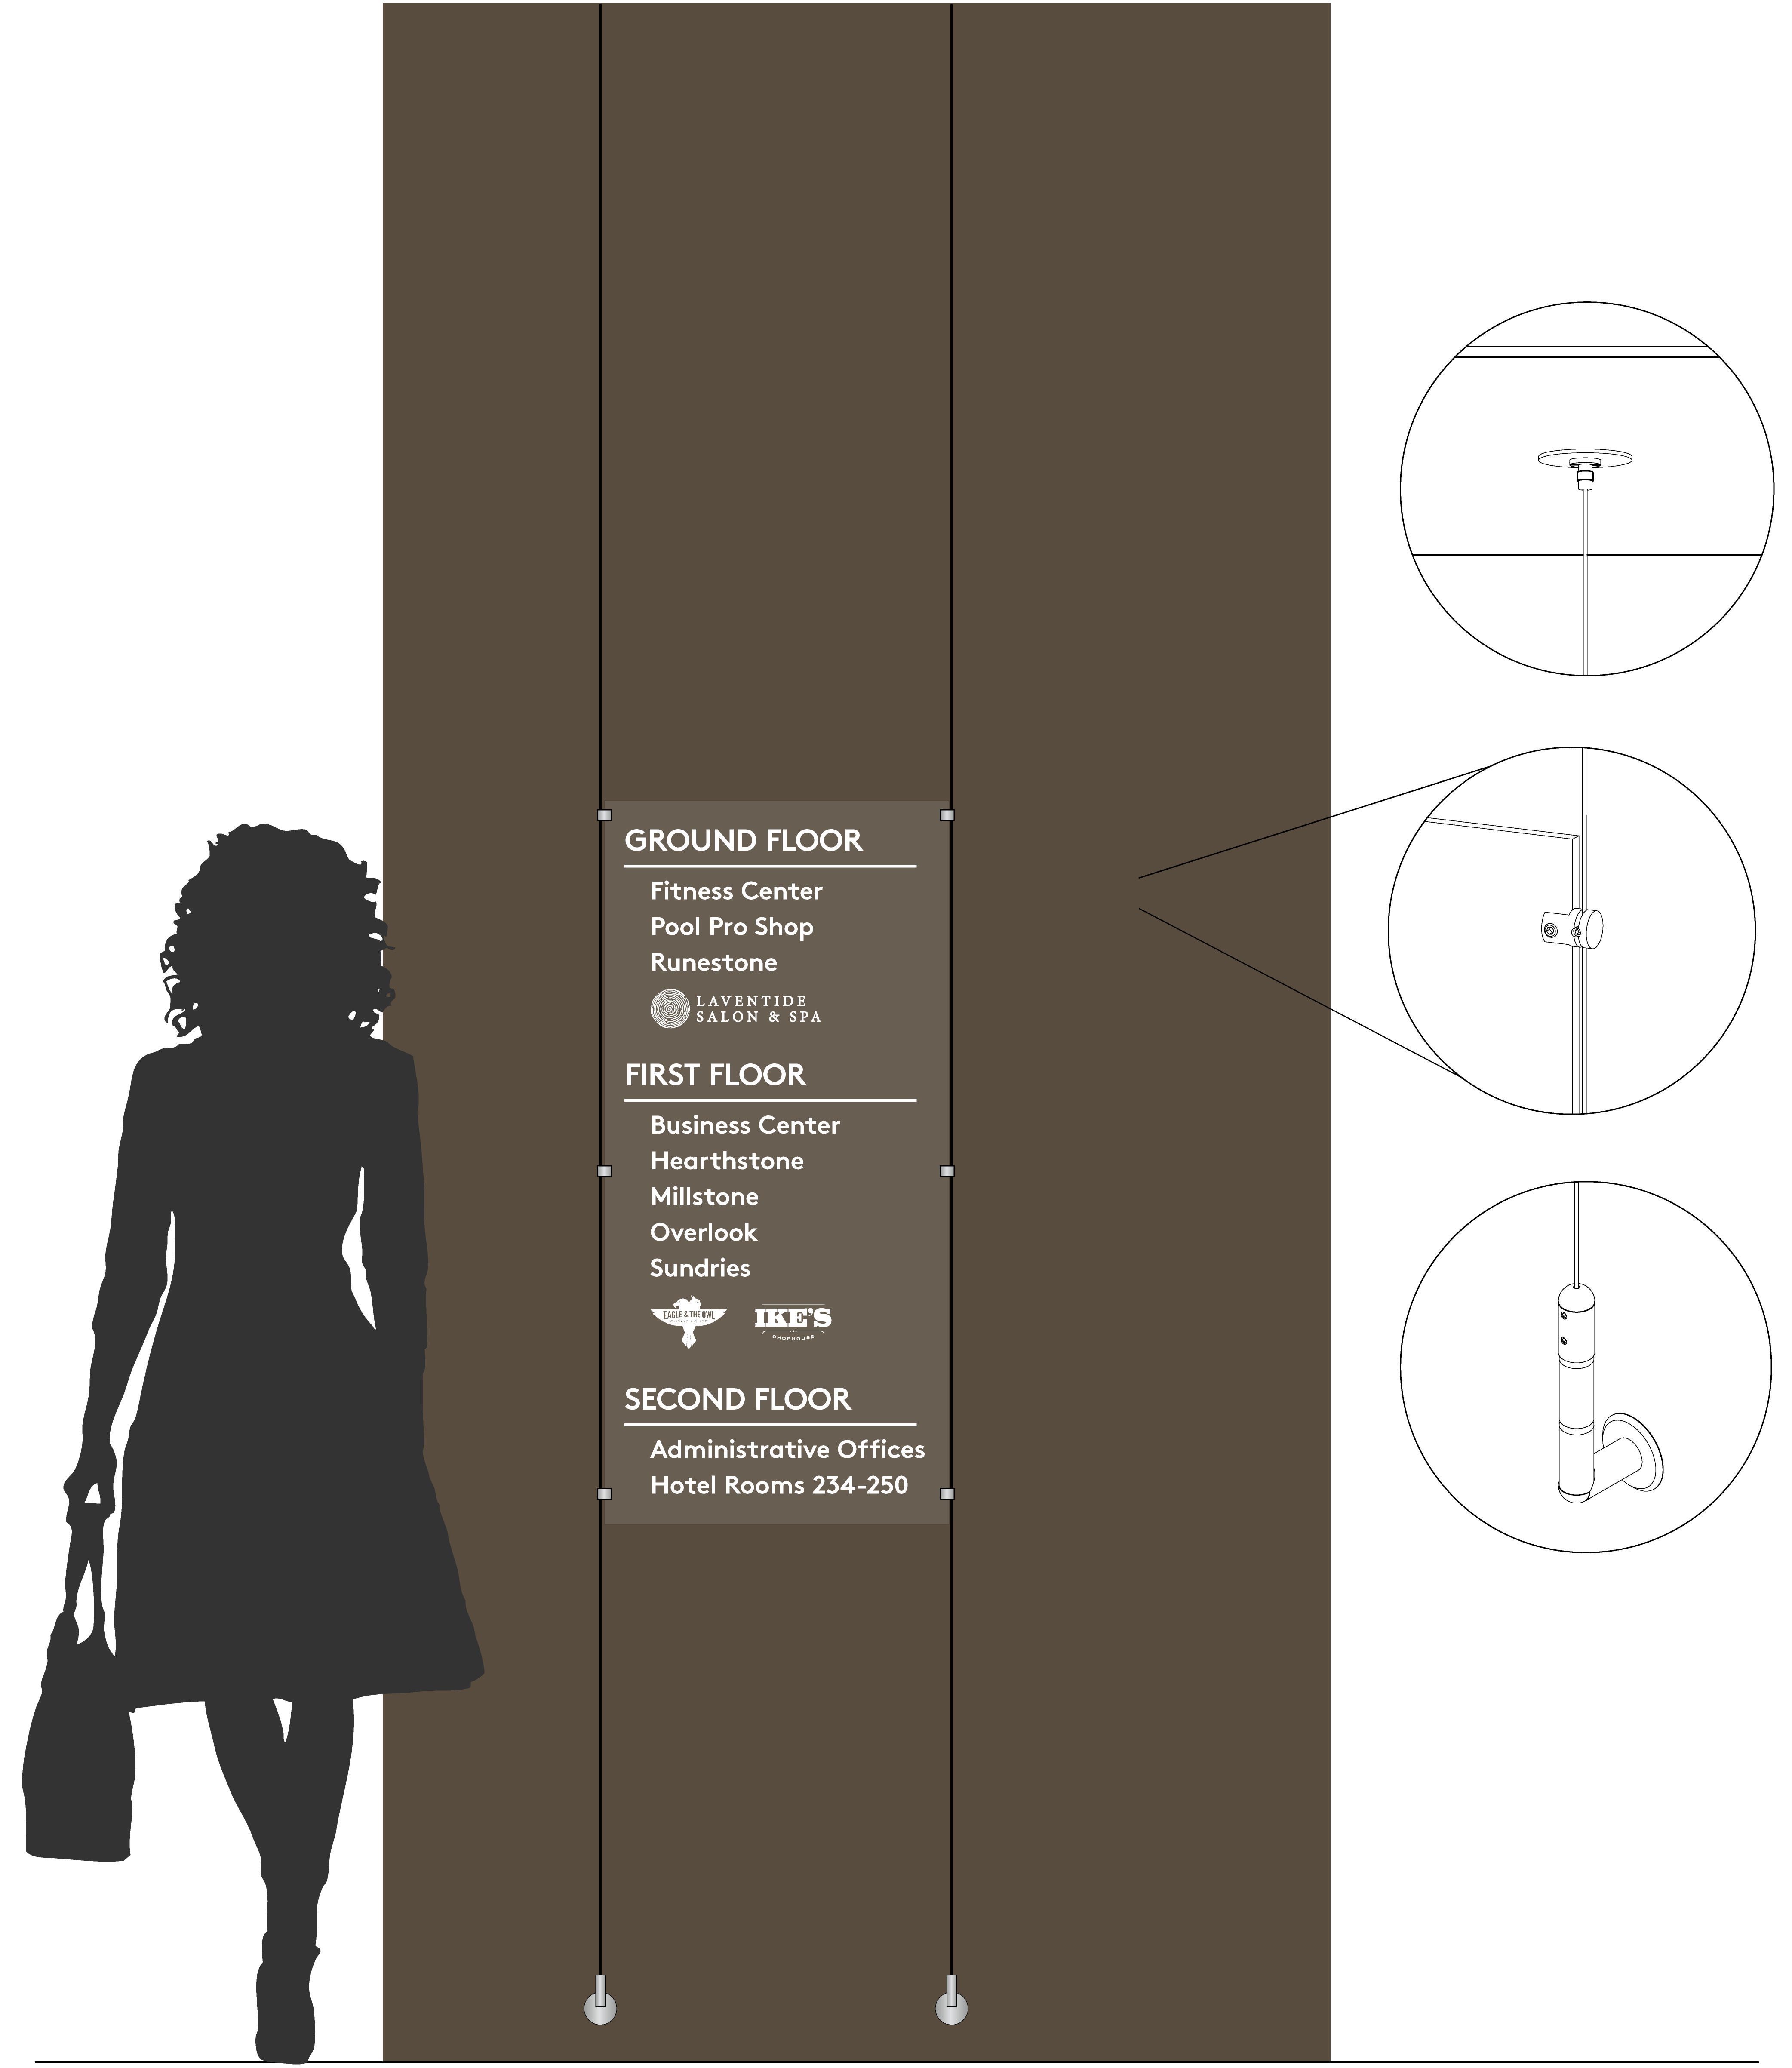 Rendering of elevator adapt sign